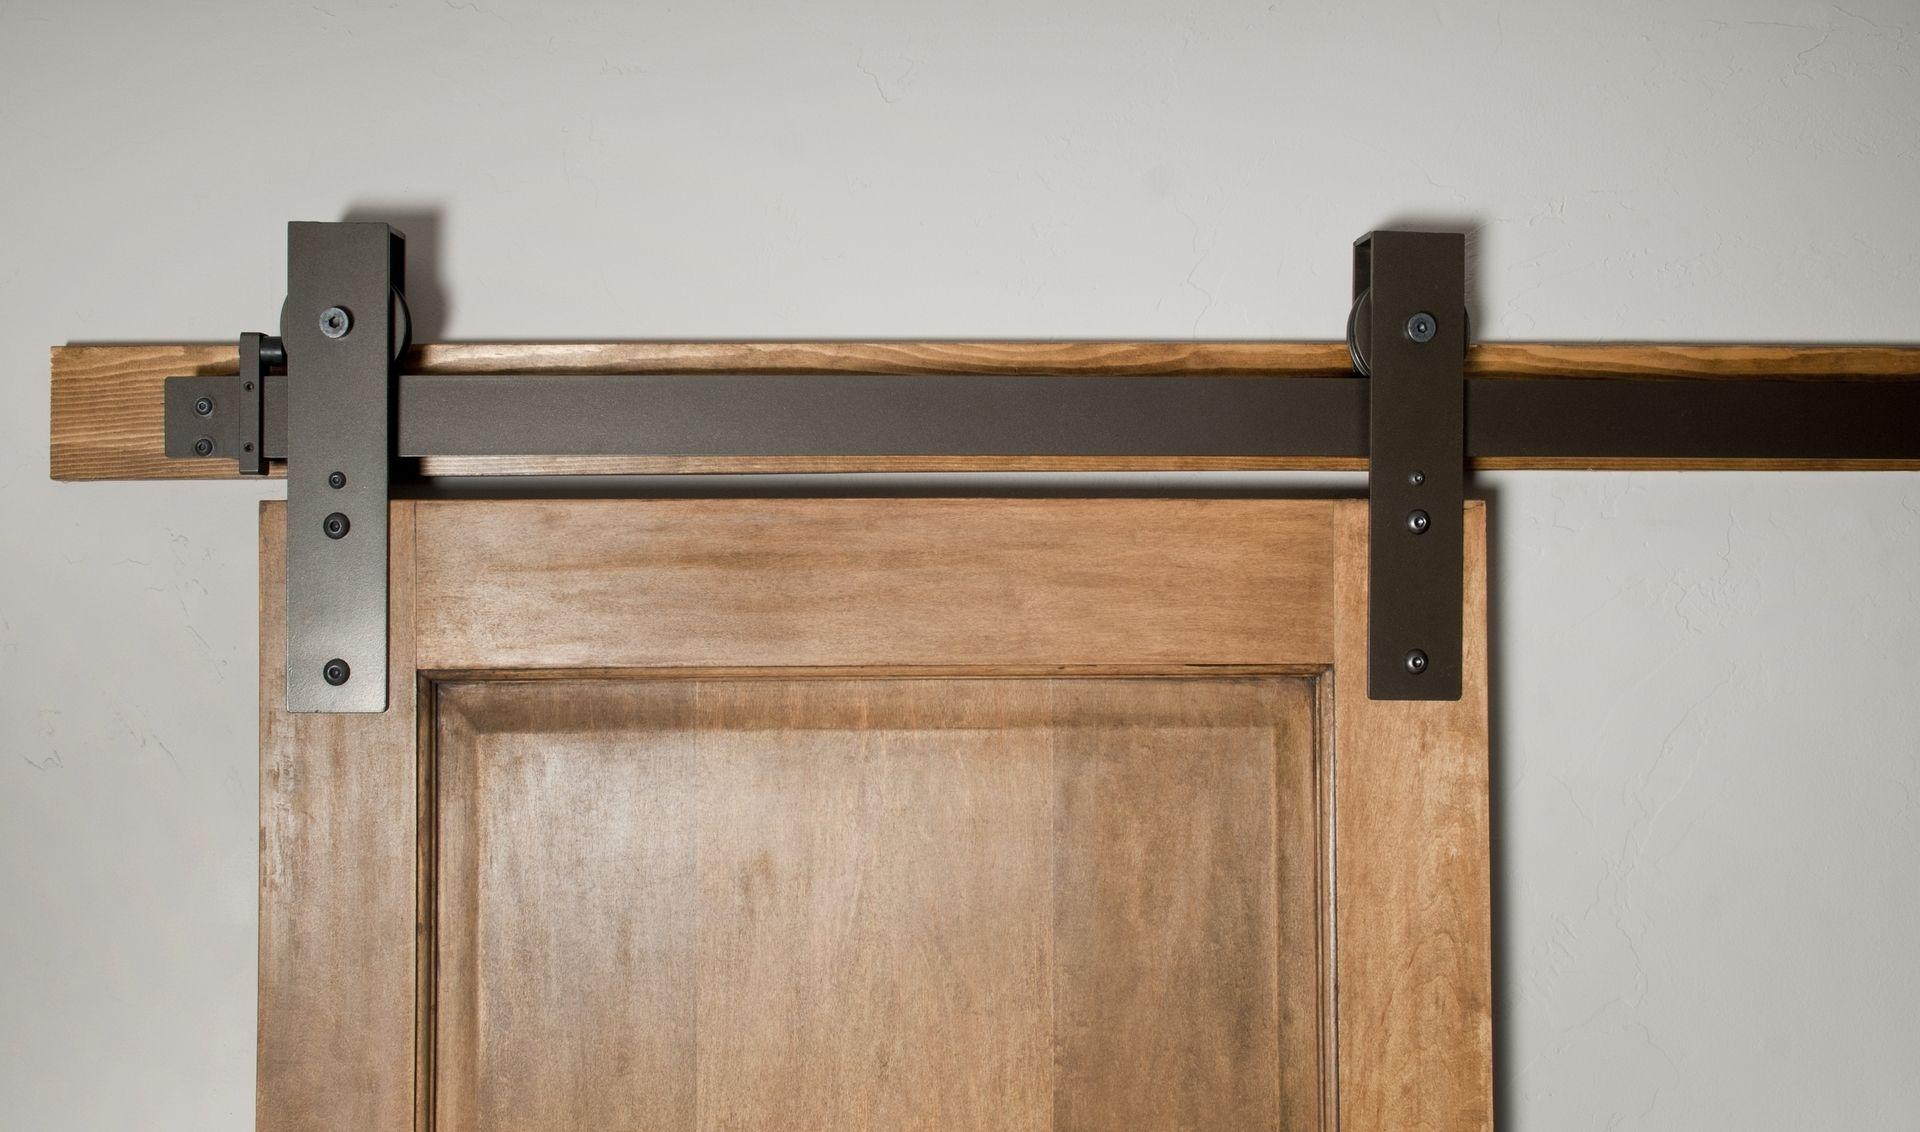 Exterior Flat Track Sliding Door HardwareExterior Flat Track Sliding Door Hardware